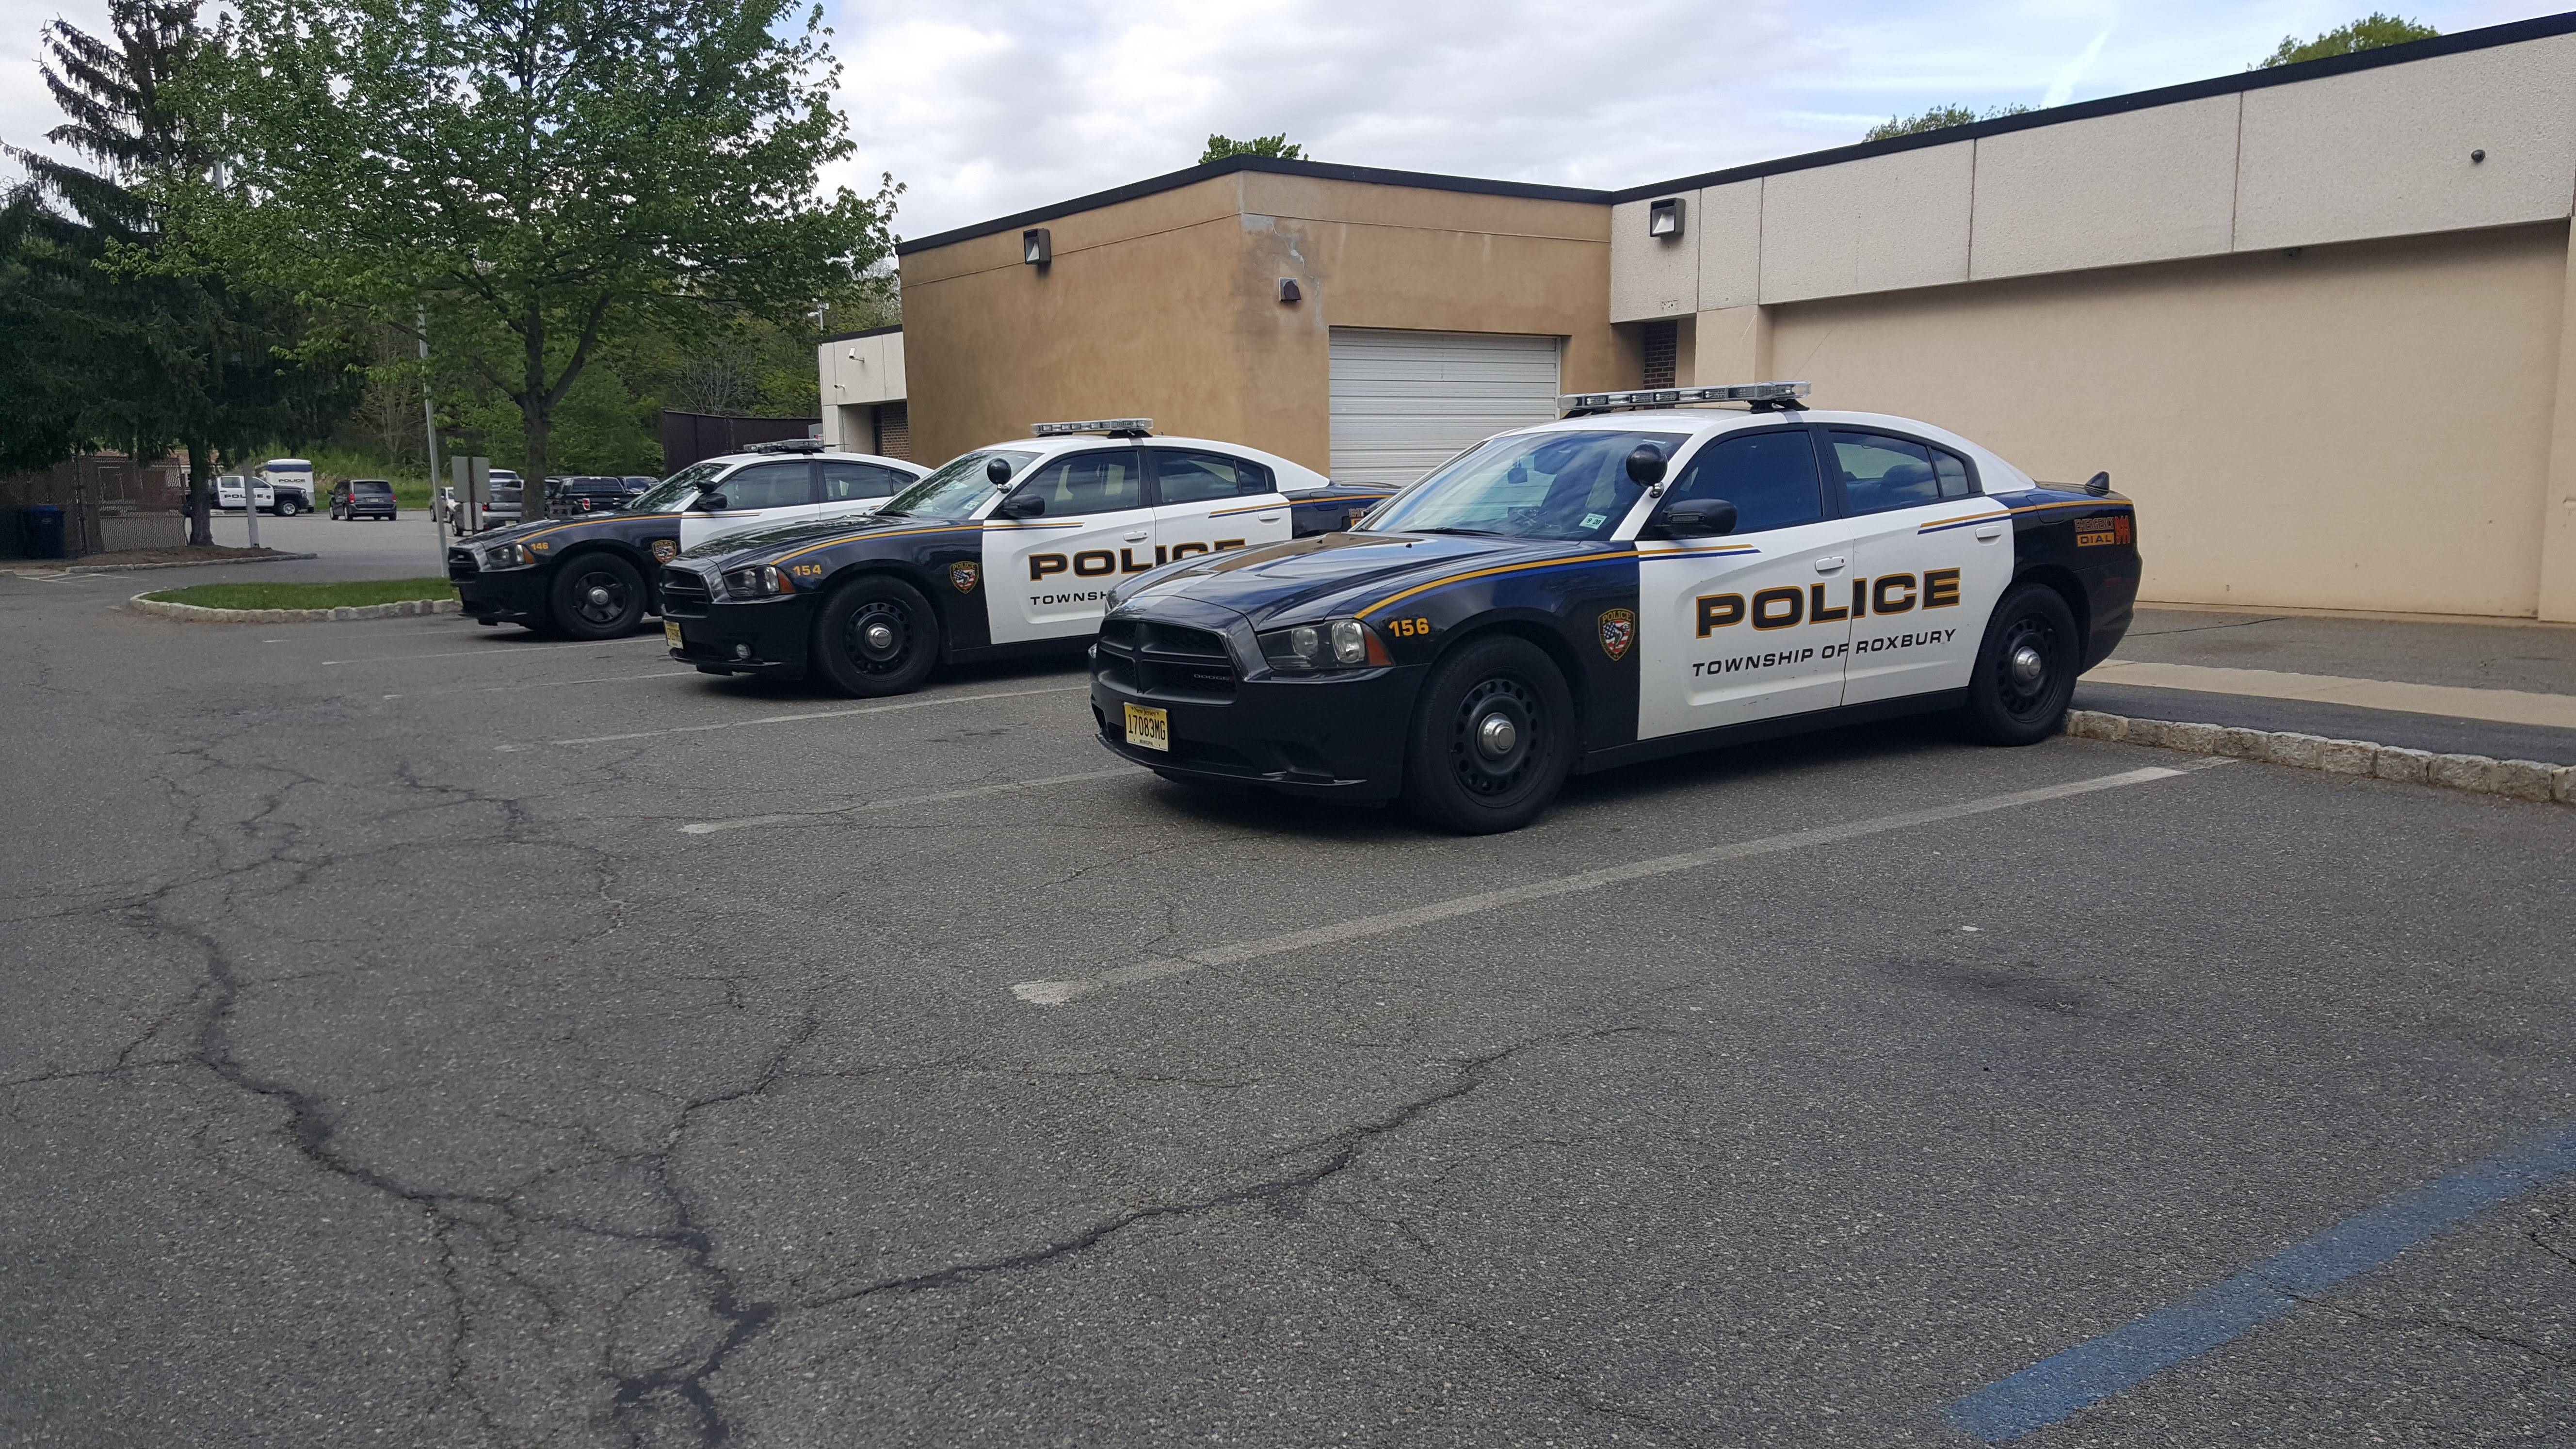 0c22b5ae1b253e73c98b_1626213a786befb31e94_roxbury_police_cars.jpg